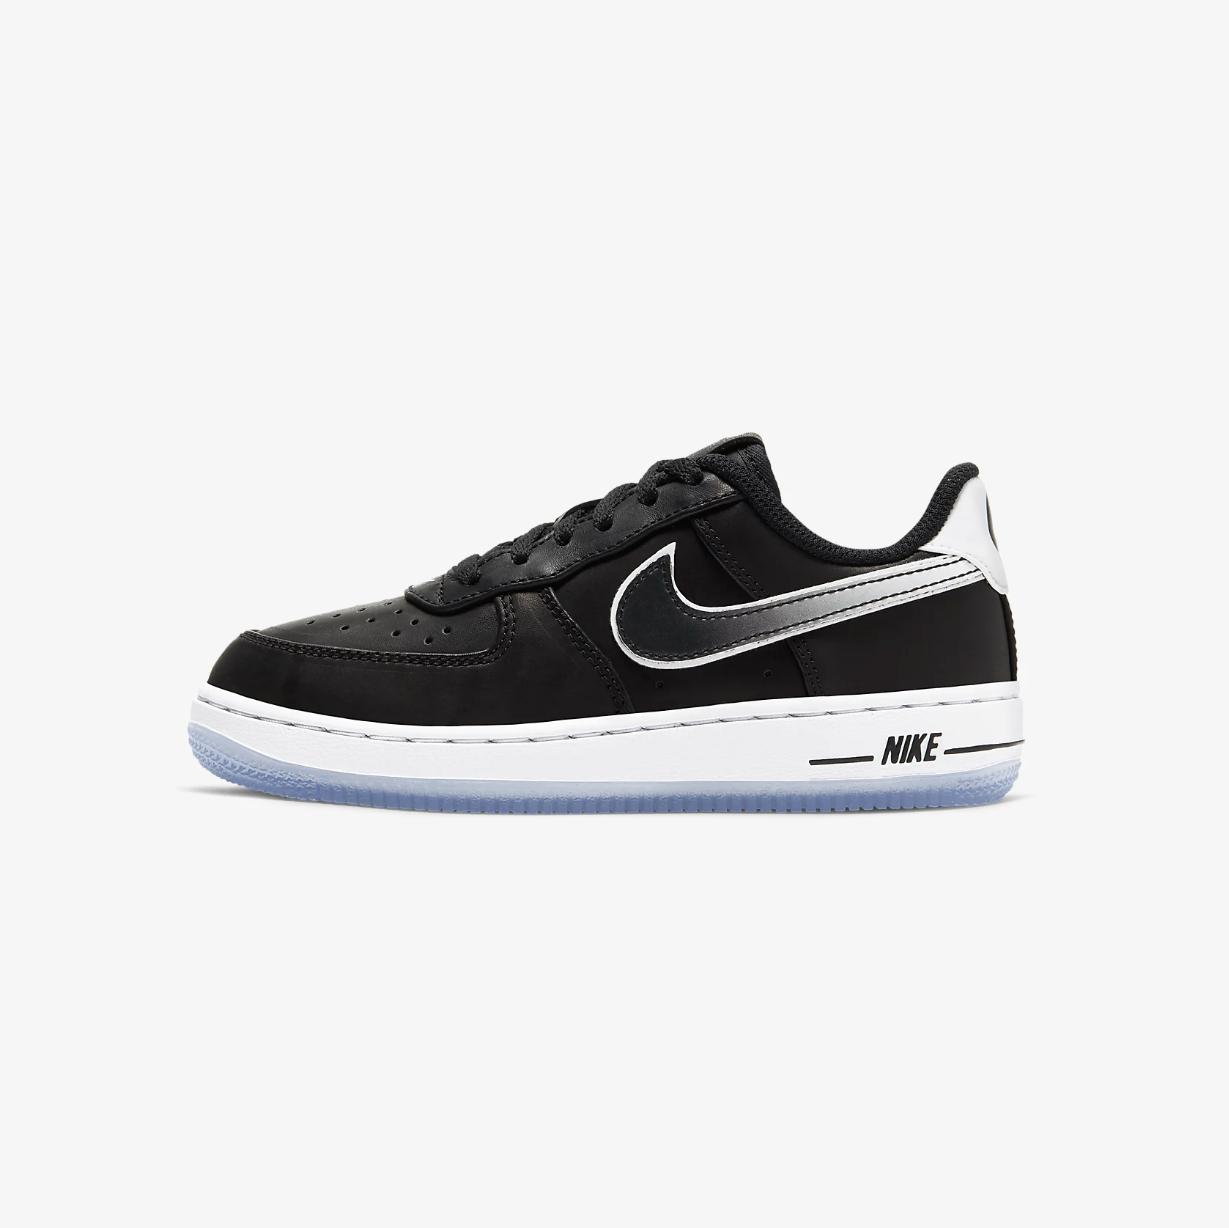 Nike Air Force 1 '07 x Colin Kaepernick little kids' shoe